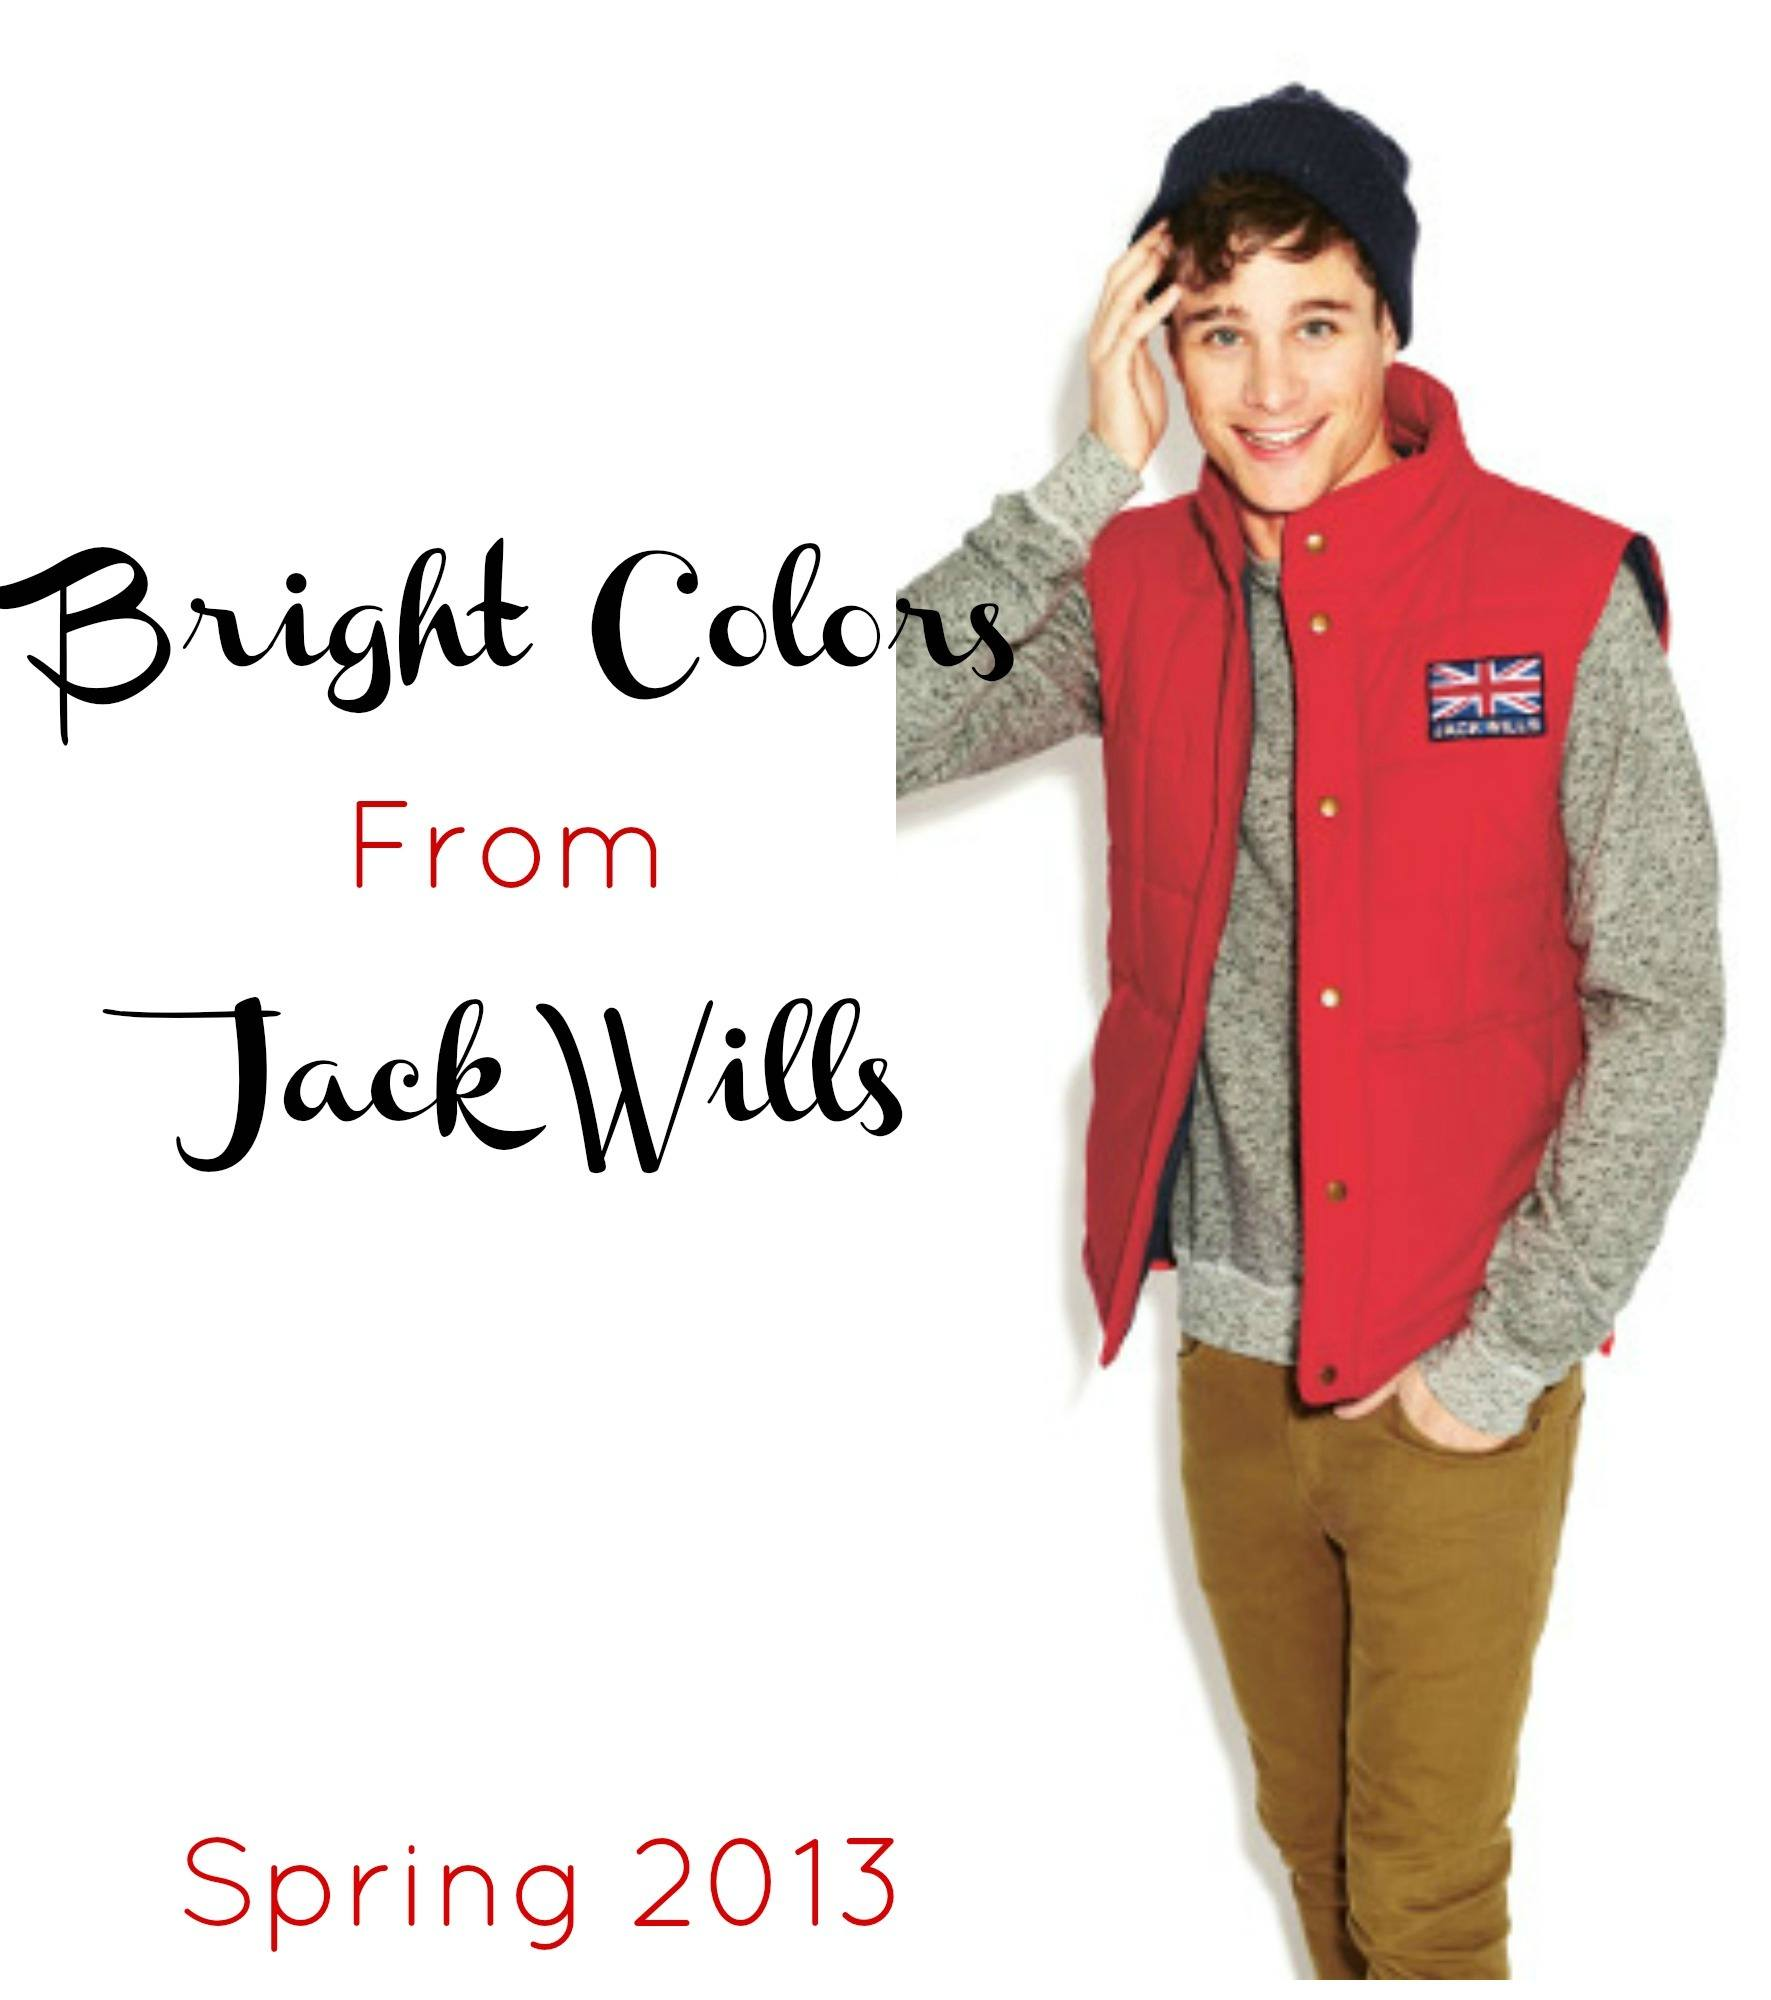 Jack Wills Spring 2013, Jack Wills Seasonnaires - the ultimate summer job, Jack Wills internship